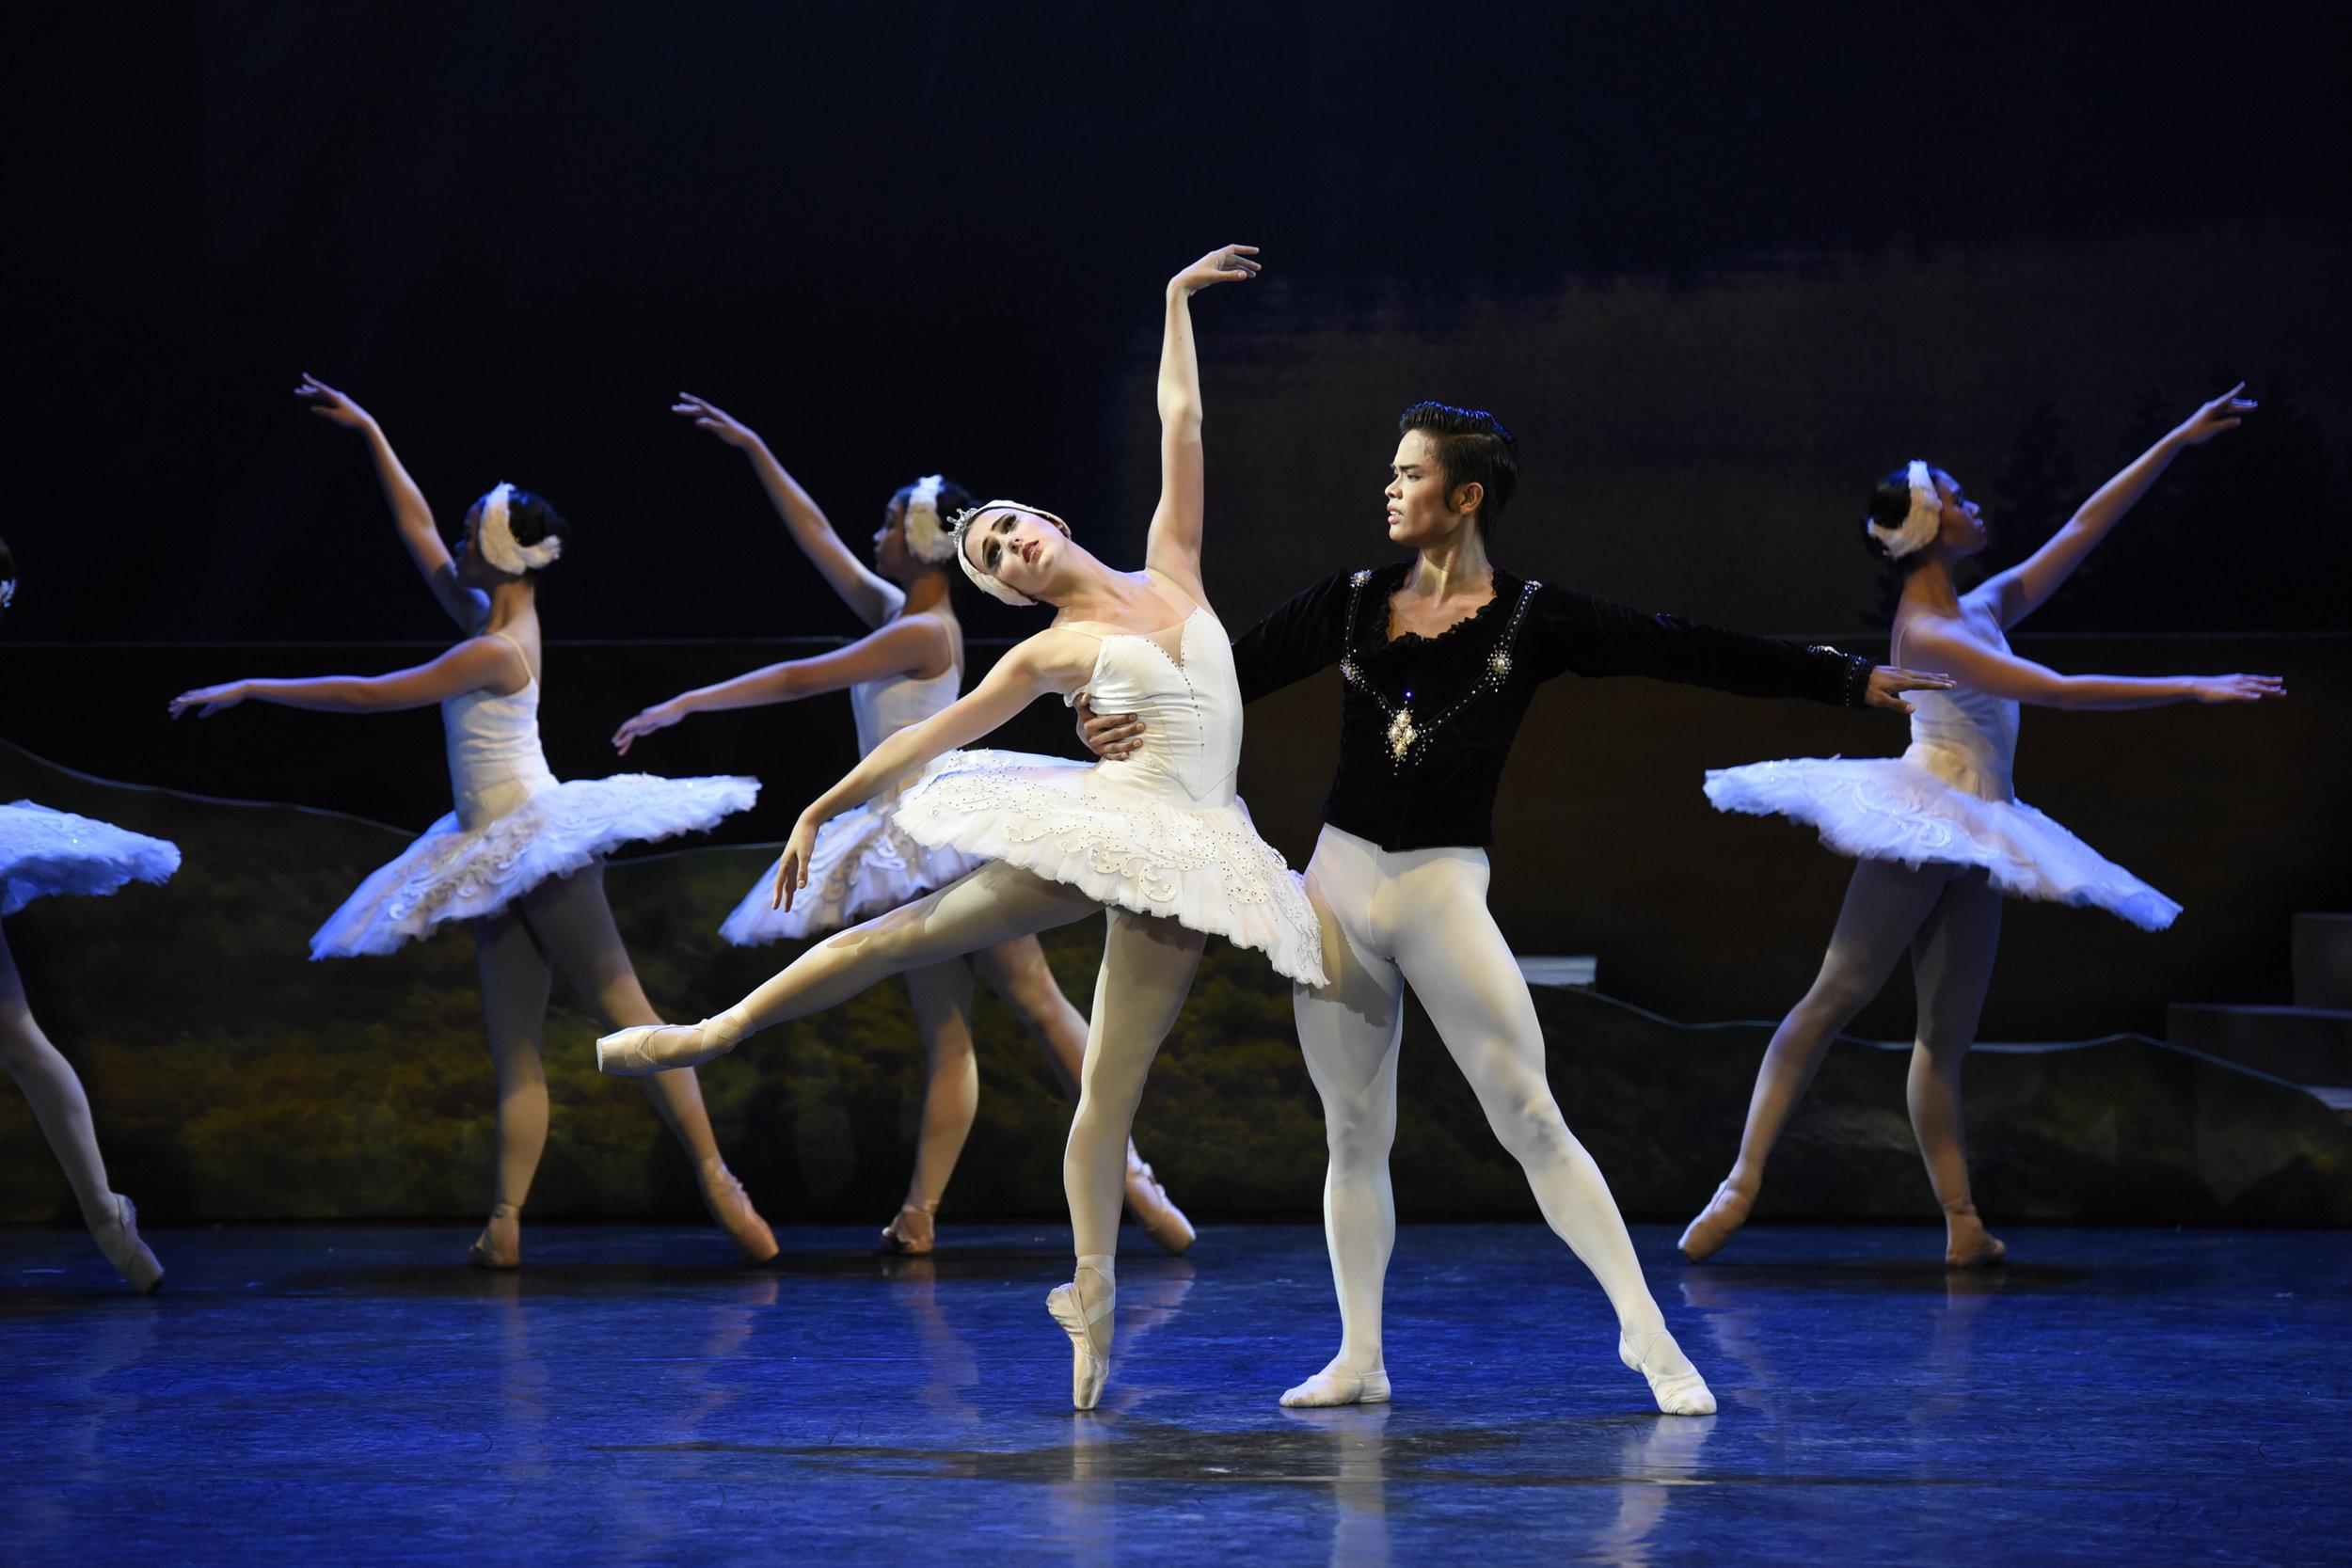 Paired with Katherine Barkman as Odette in    Swan Lake    (2017), Elpidio Magat dances as Prince Siegfried. Photo by Ocs Alvarez